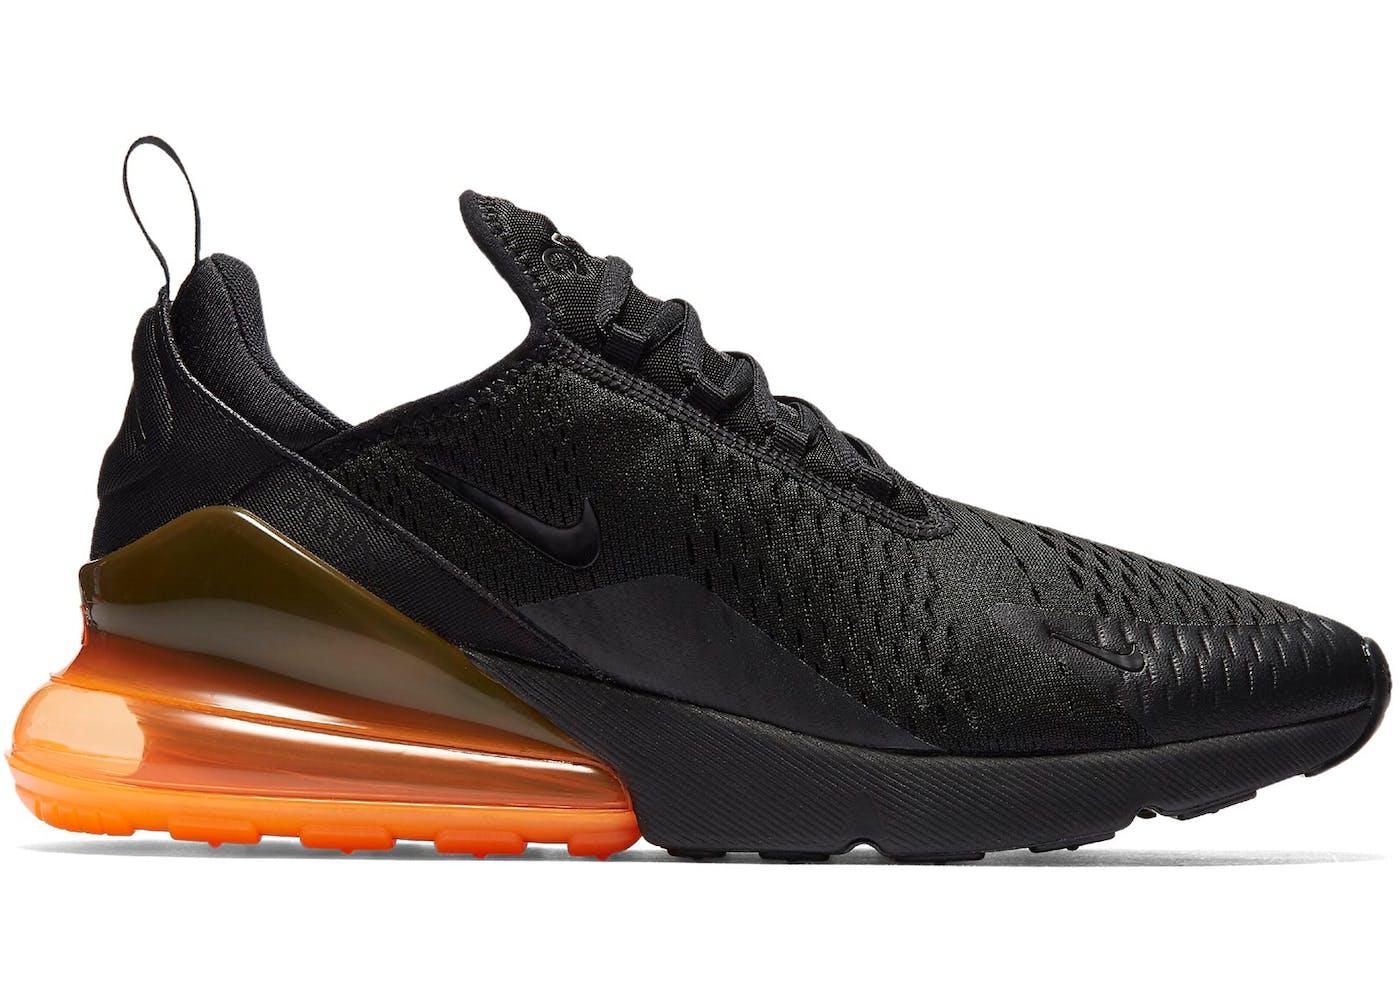 Nike Air Vapormax Plus Black/Total Orange/Total Crimson/Tour Yel